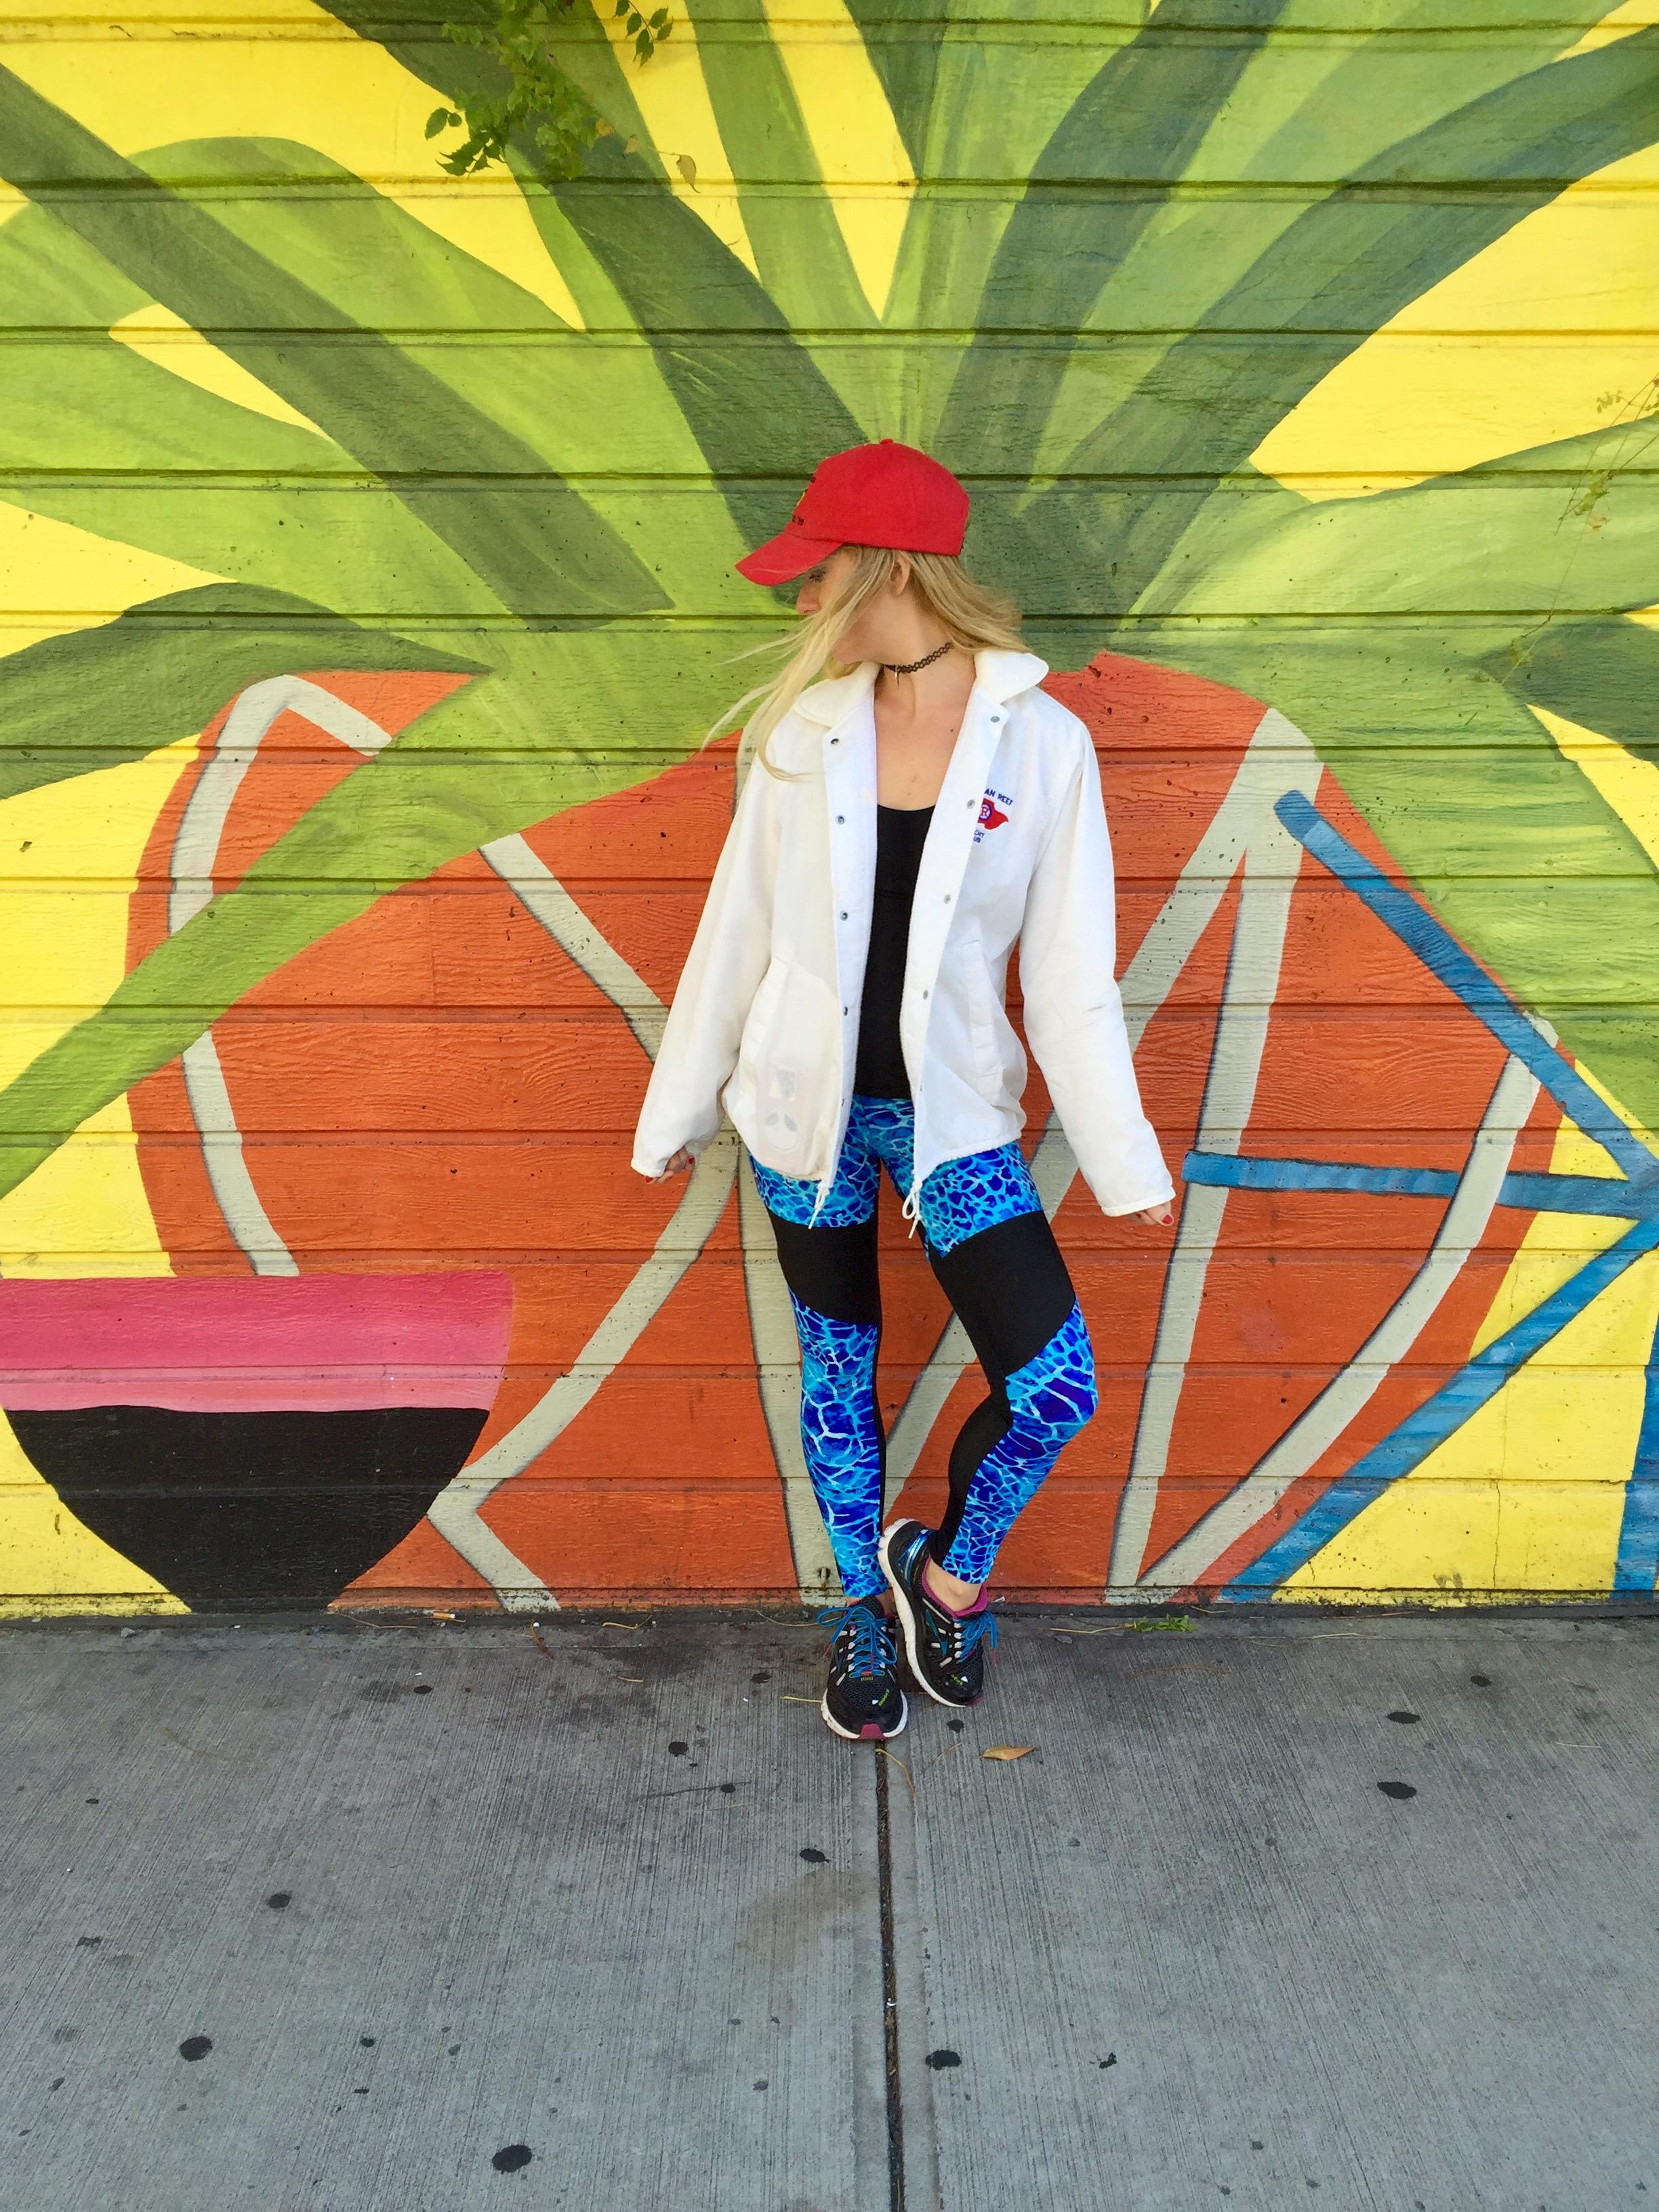 Hat and Jacket: Vintage, Top: Lululemon, Leggings: Zion's Den Apparel, Sneakers: Brooks Running